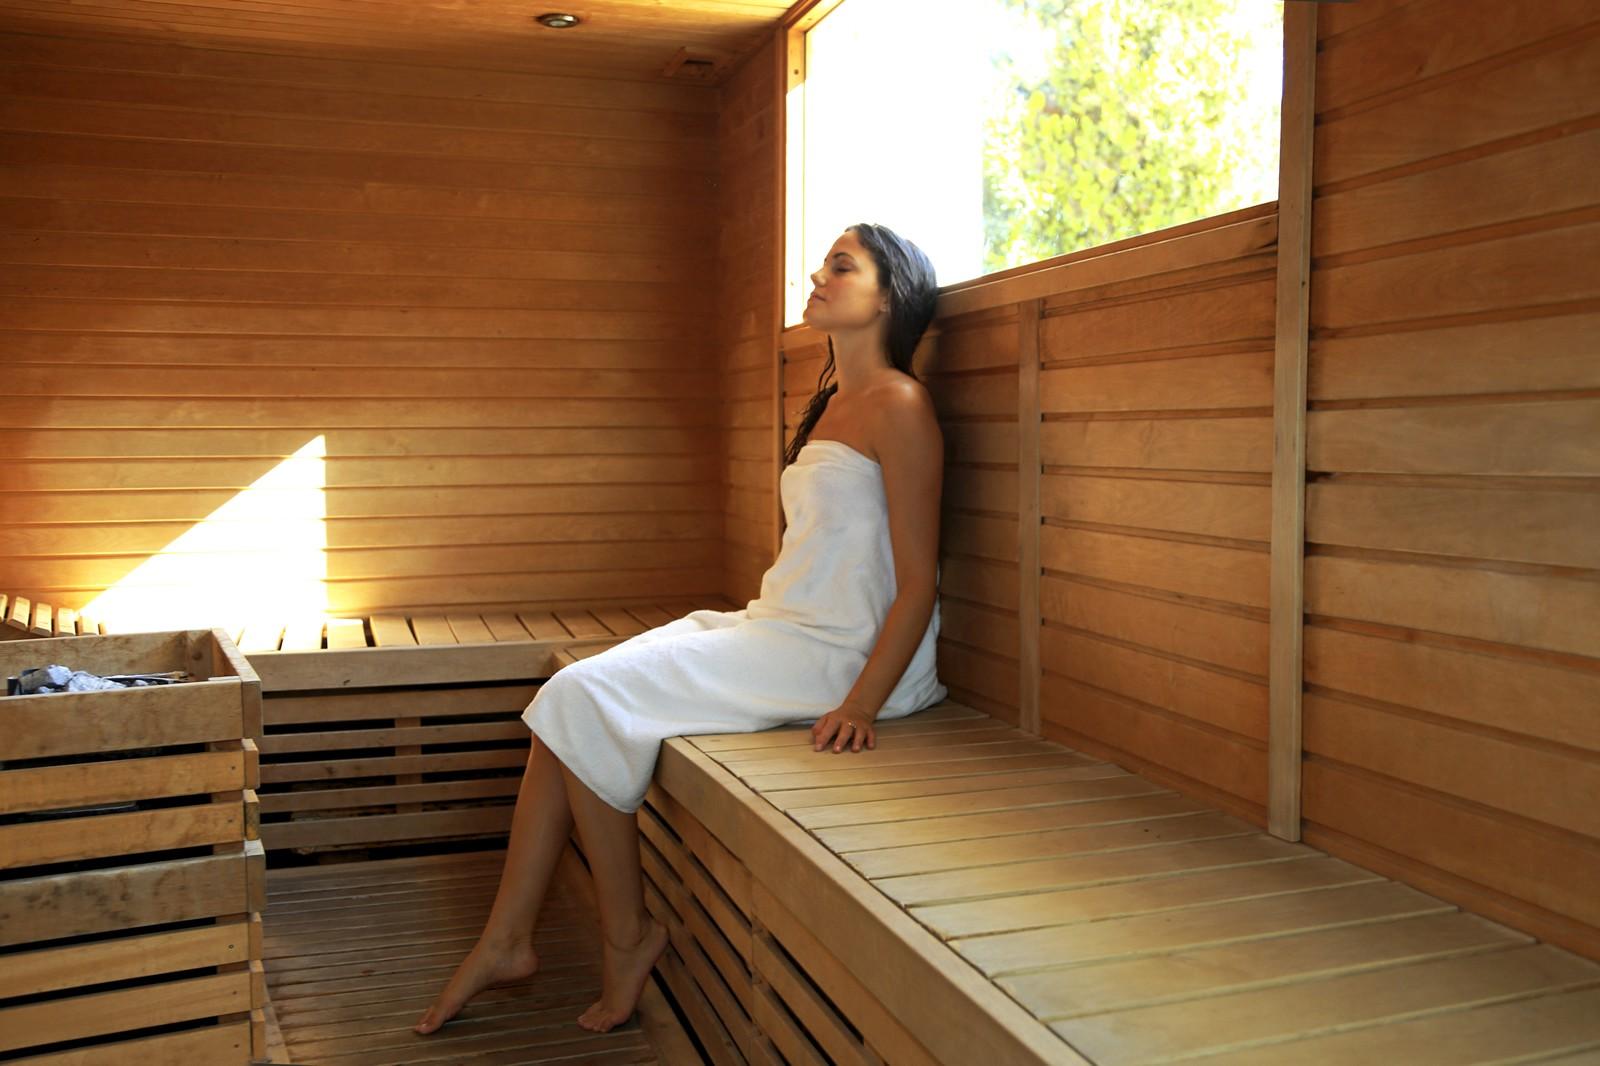 Abano Terme Sauna Bagno Turco.Hotel 4 Stelle Abano Terme Alberghi Abano Terme 4 Stelle